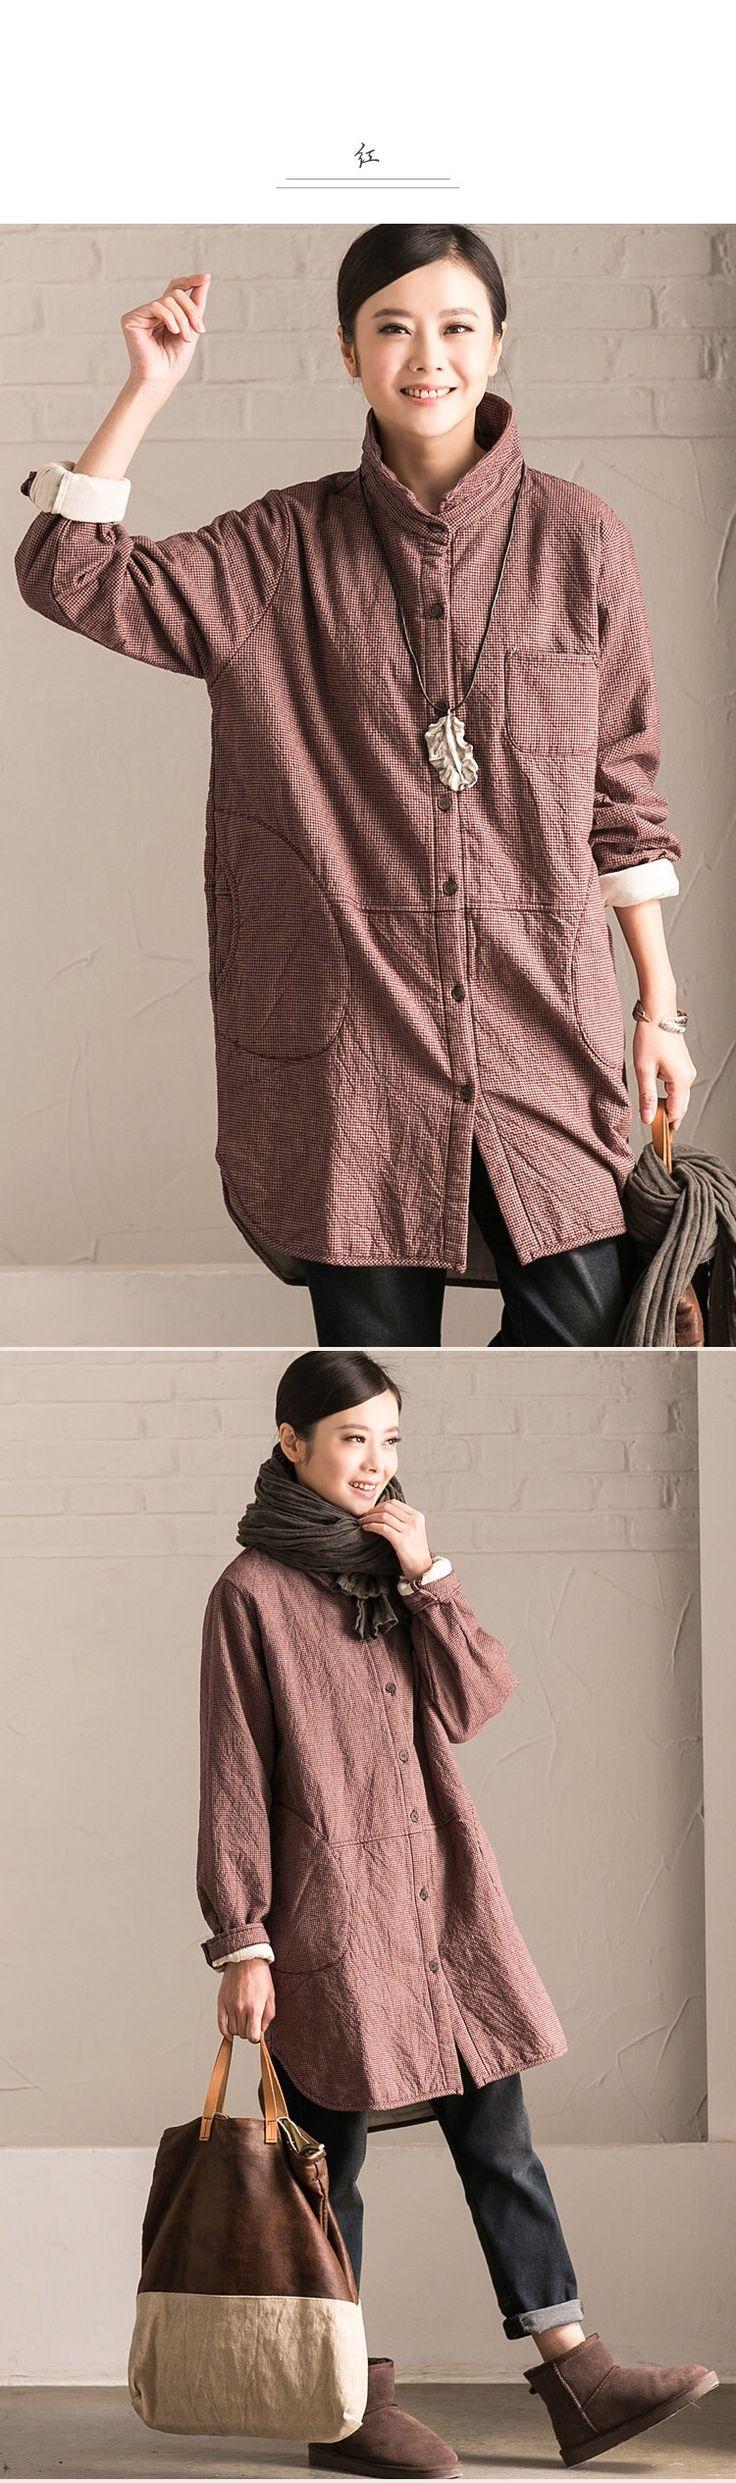 Warm winter loose shirt fashion clothes